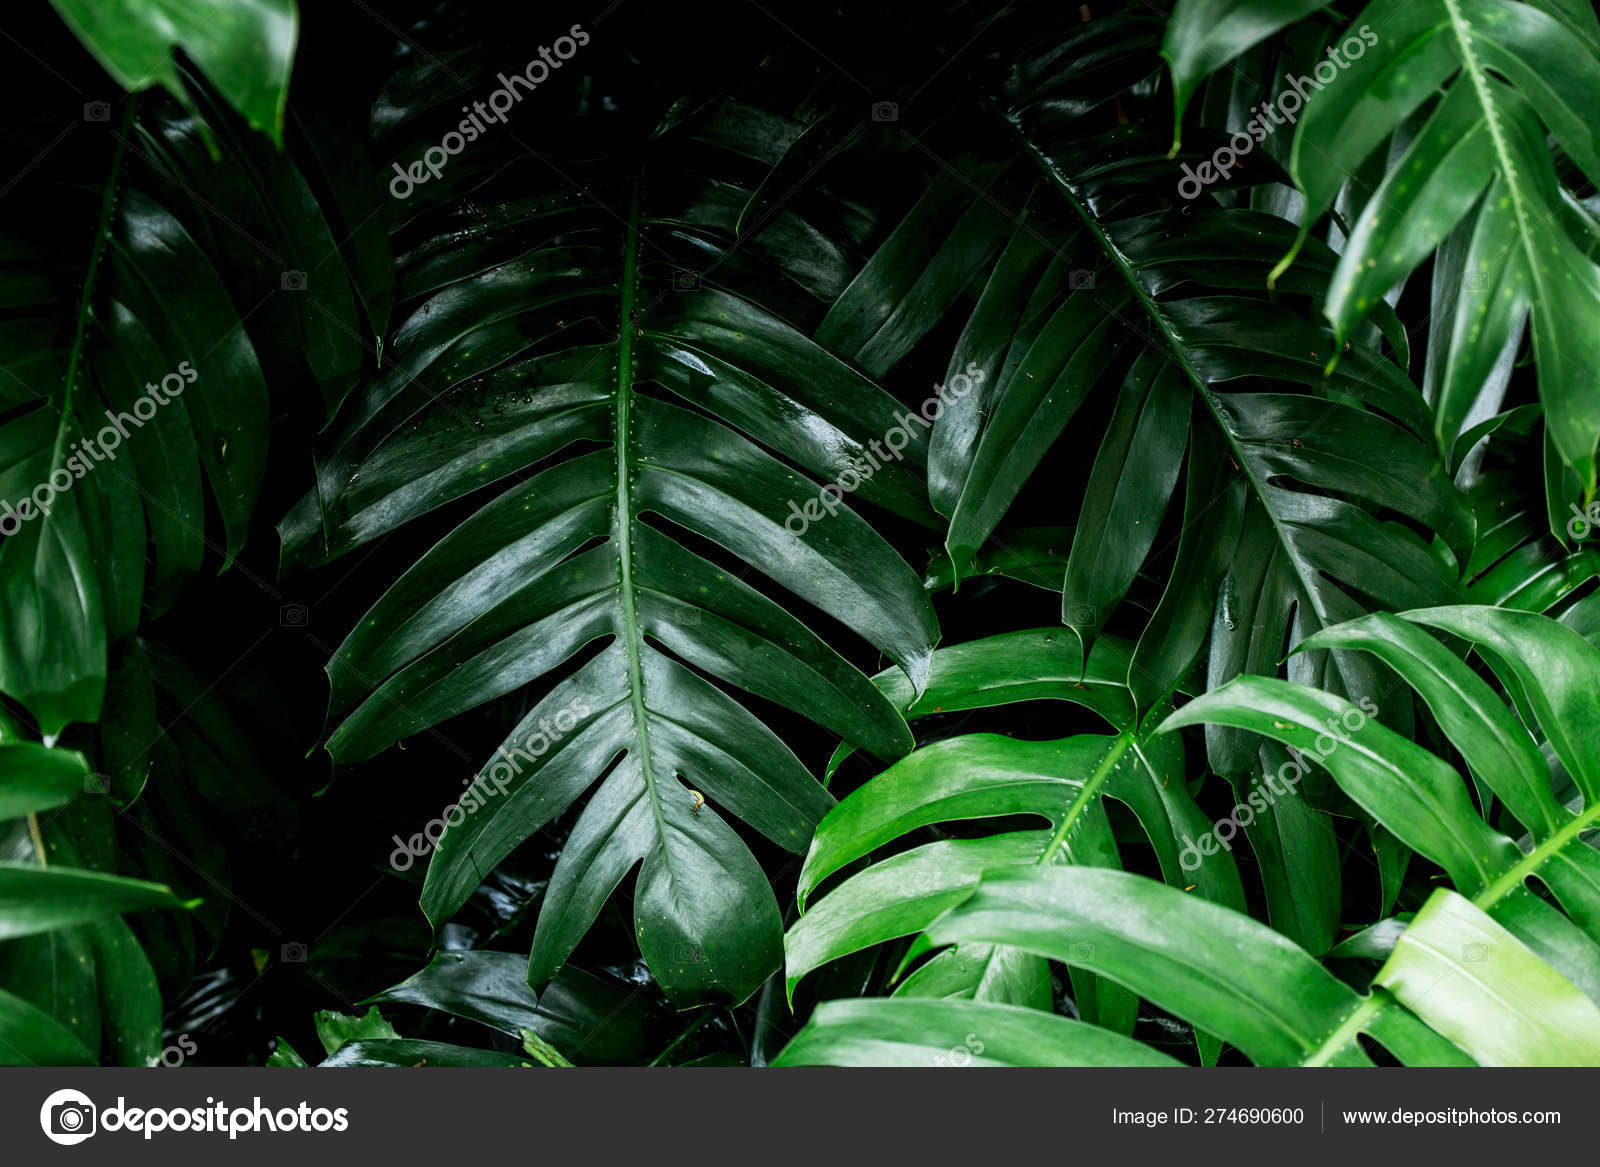 Tropical Rainforest Green Leaf Image Home Decoration Stock Photo C Coffeekai 274690600 Download tropical rainforest stock vectors. tropical rainforest green leaf image home decoration stock photo c coffeekai 274690600